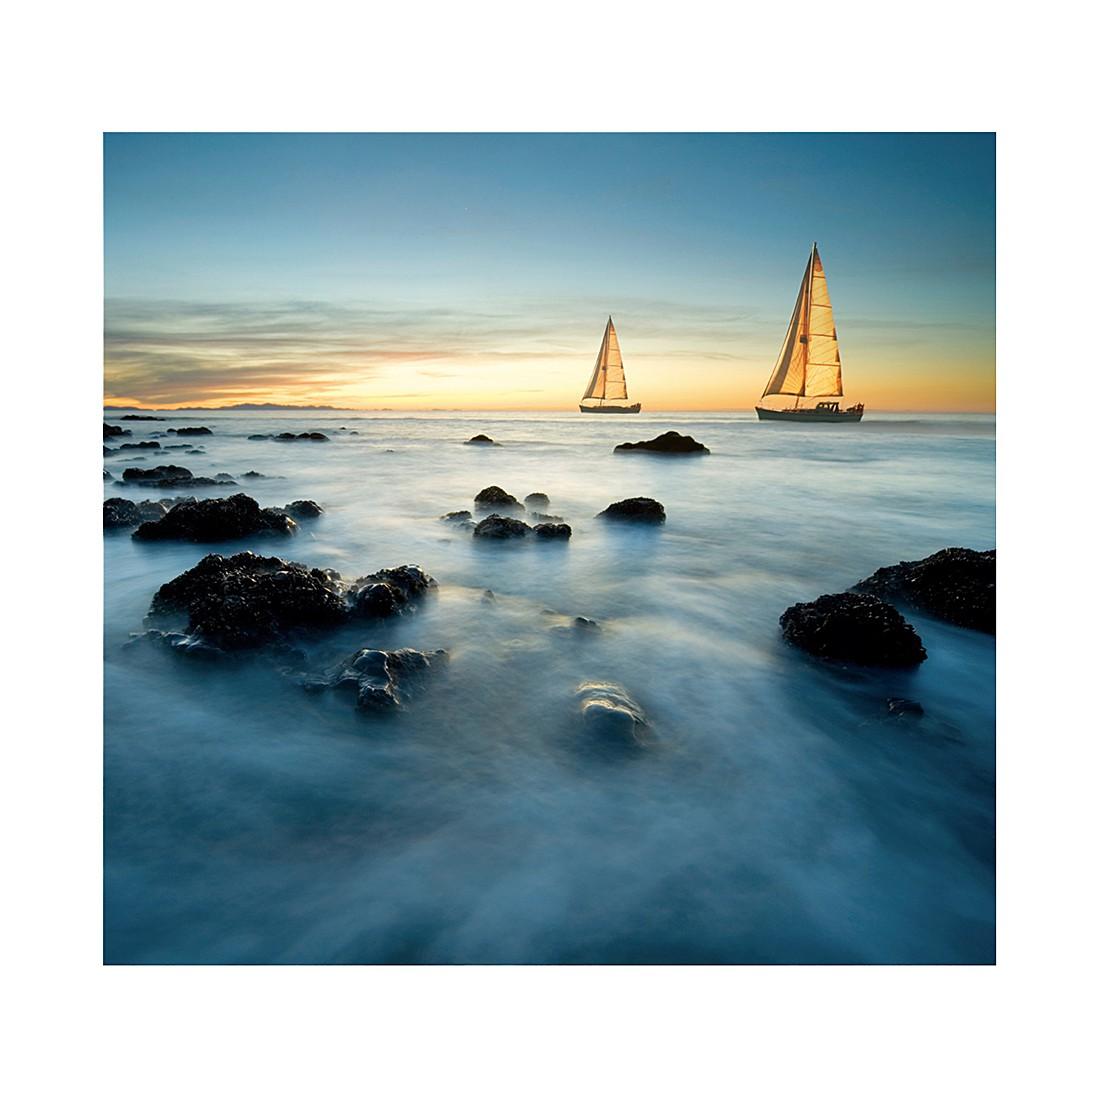 Fototapete Sailing The Ocean, Mantiburi online bestellen